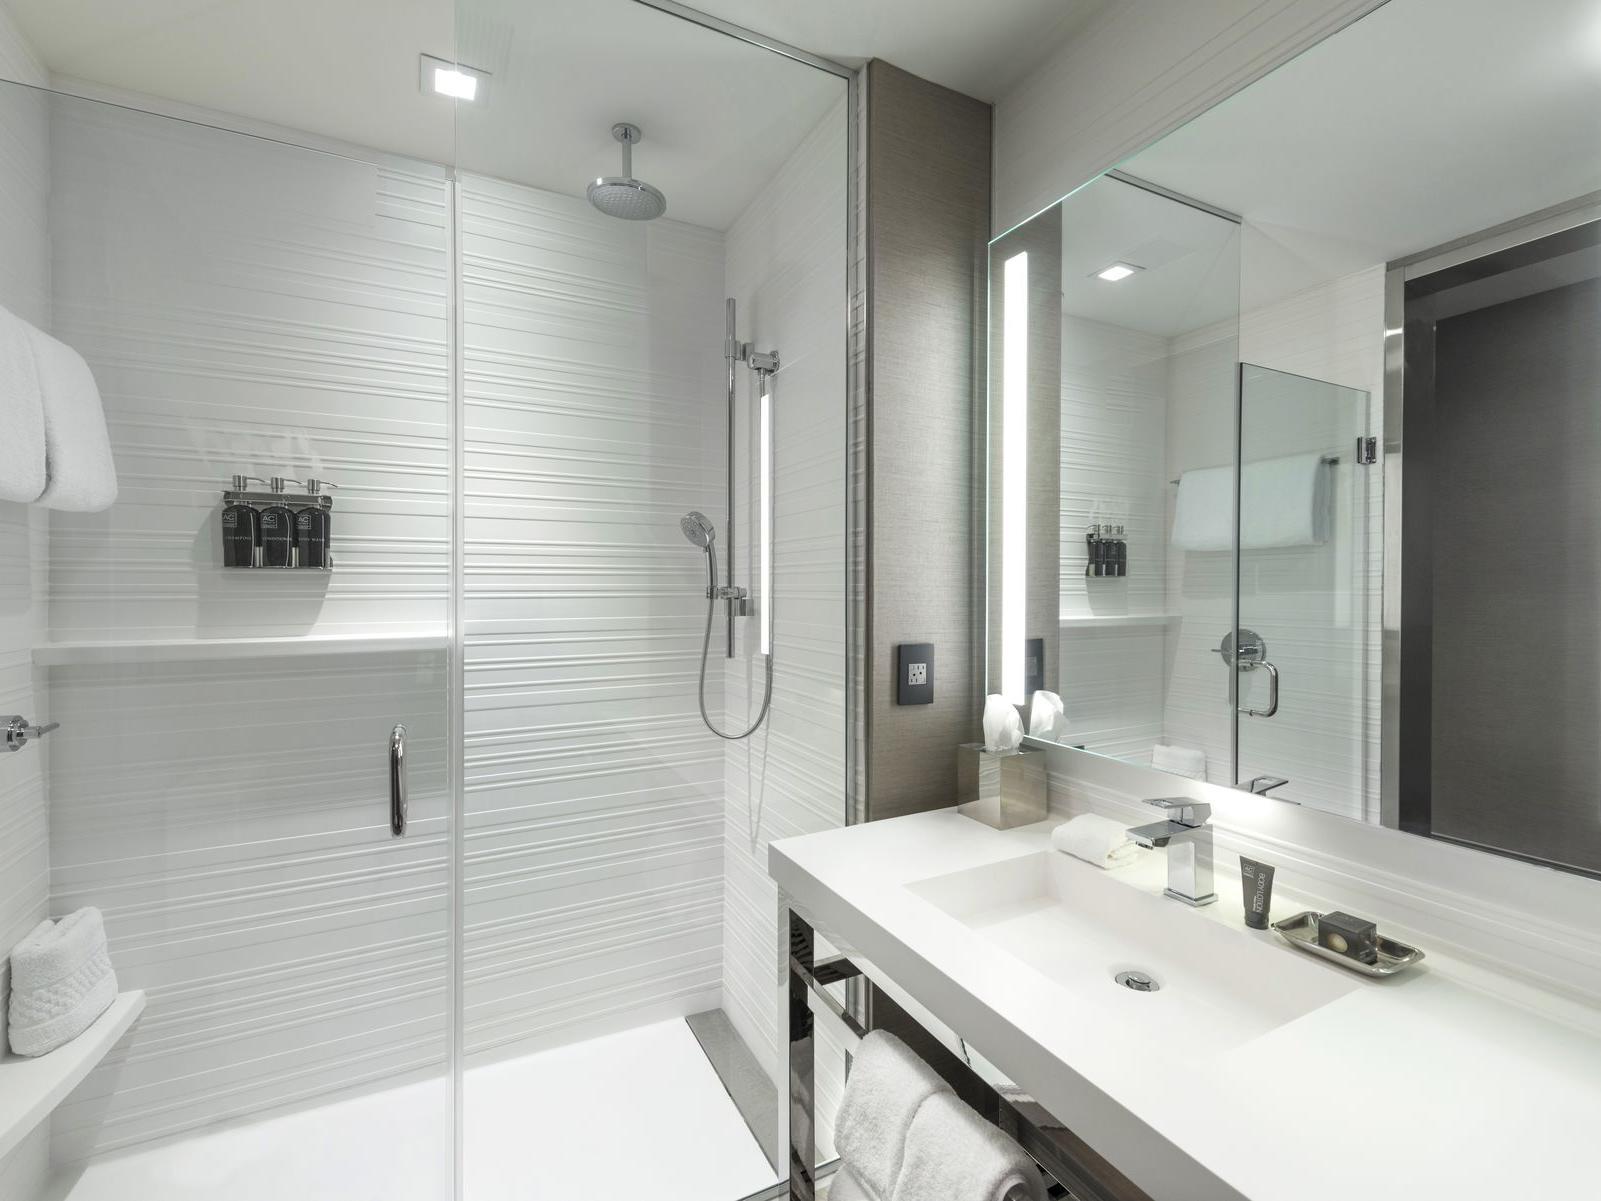 Bathroom vanity and walk in shower